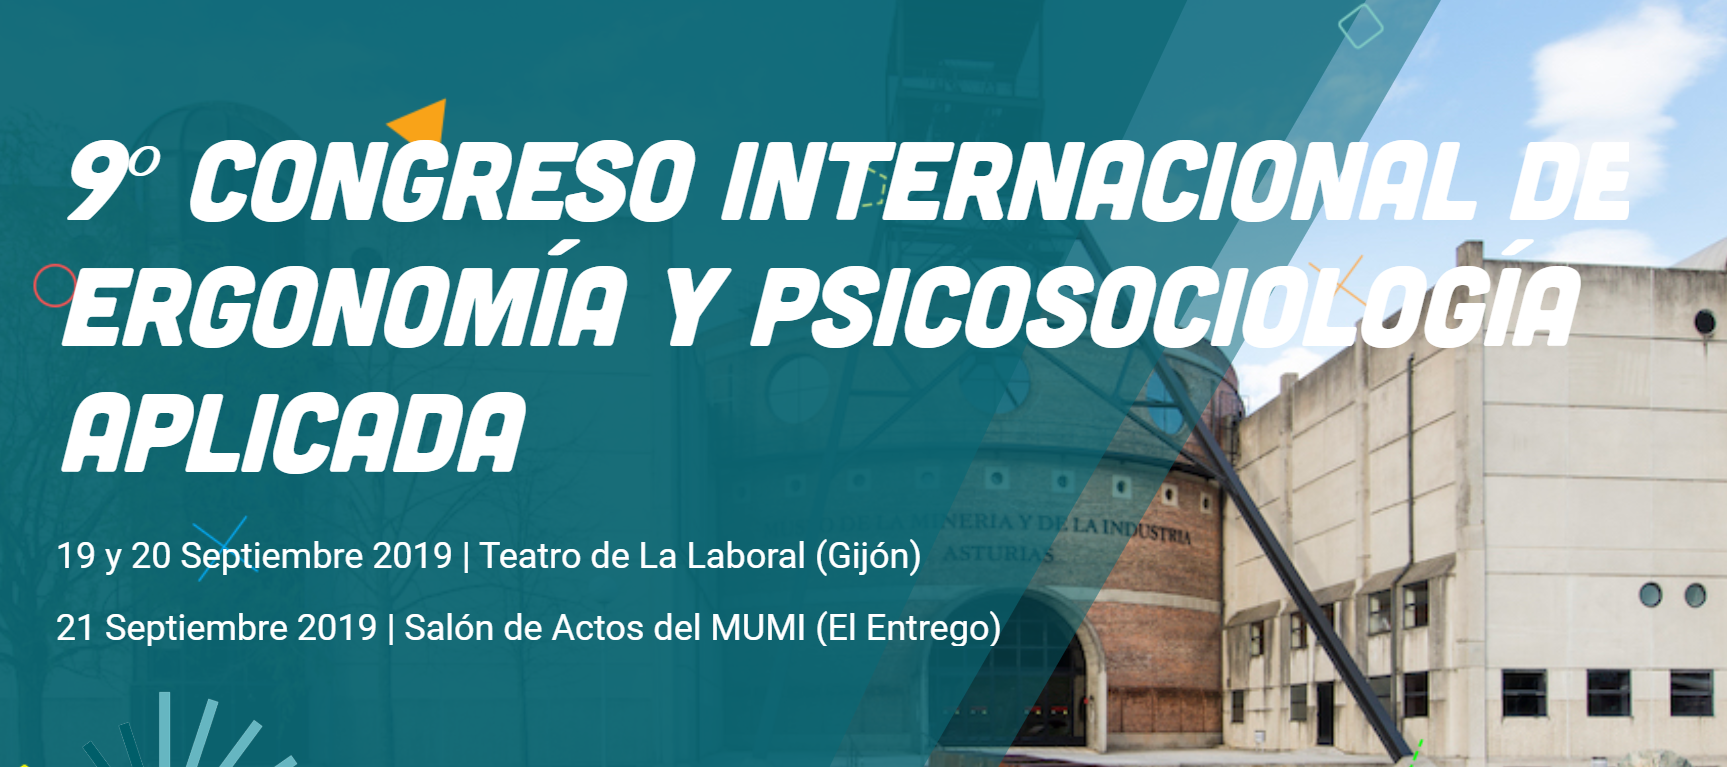 affor-participa-congreso-psicosociologia-preveras